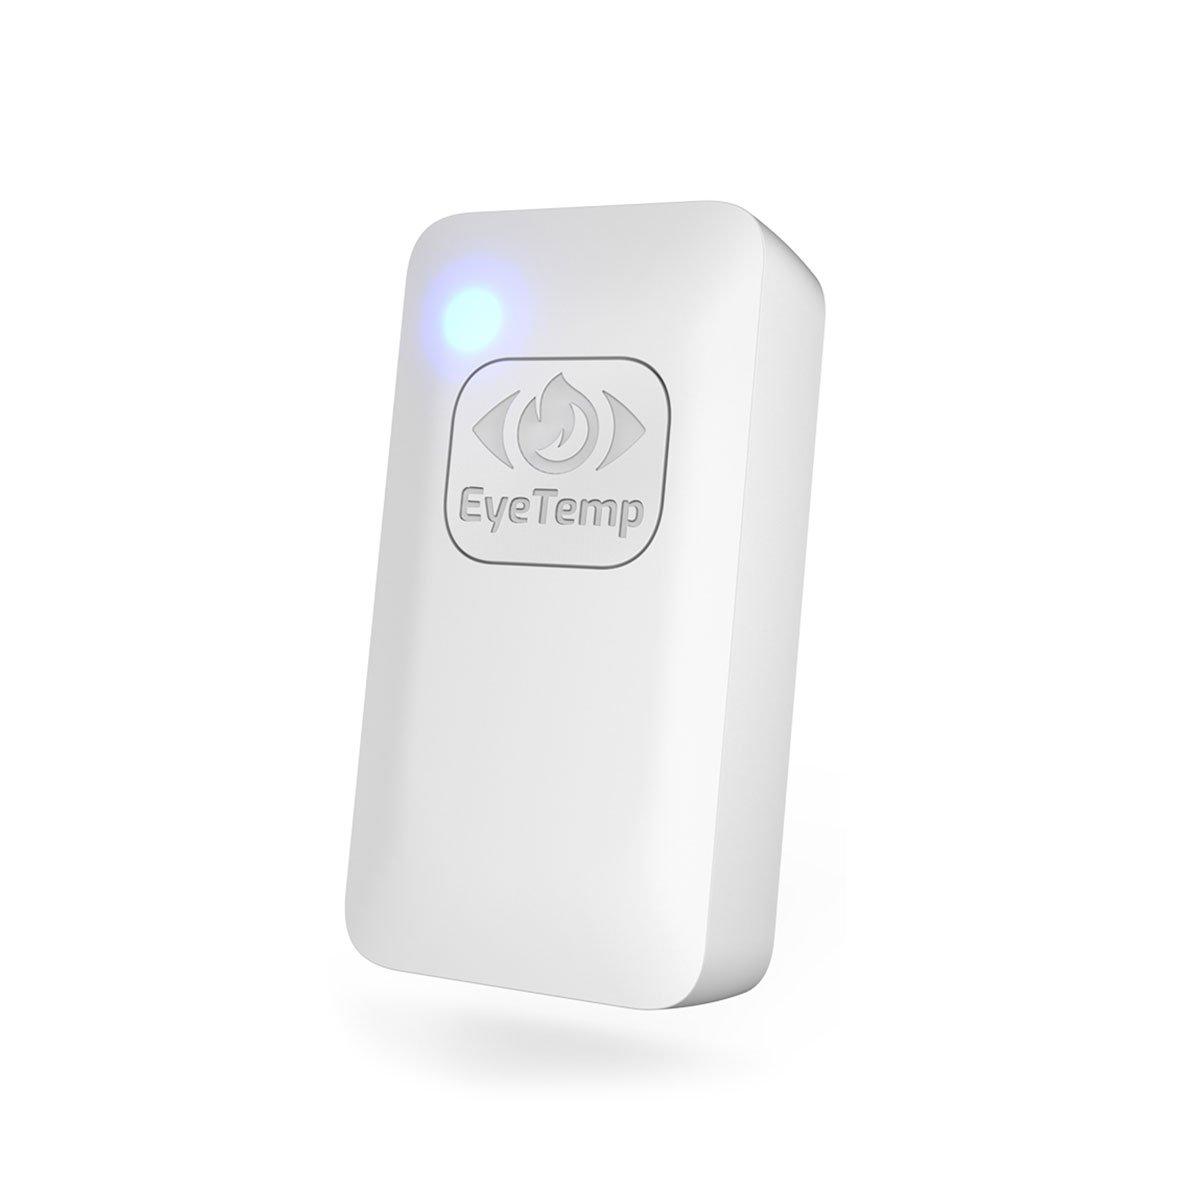 EyeTemp Heat Sensor Monitor